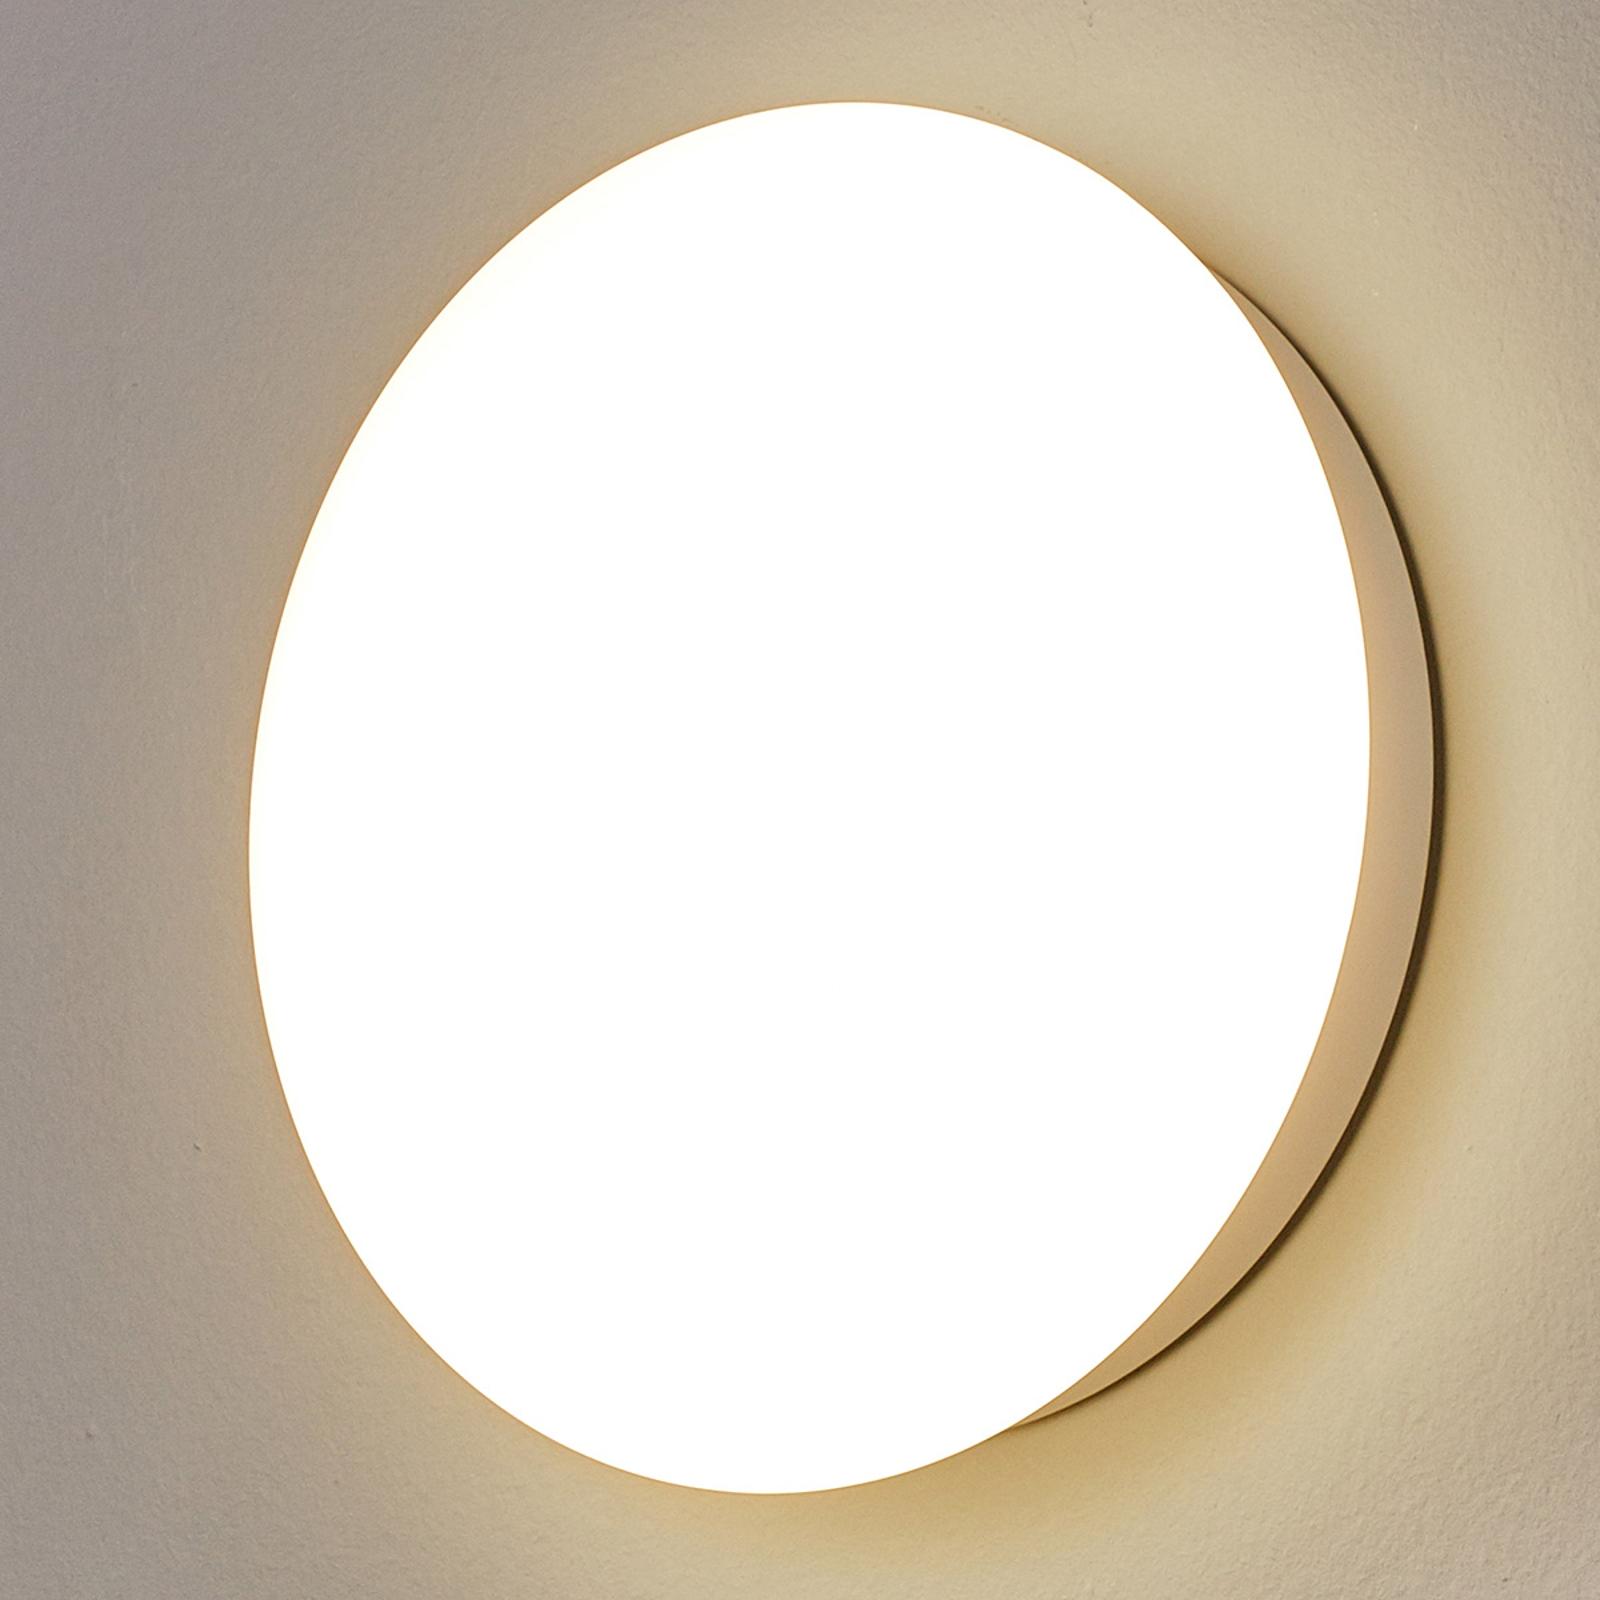 SUN 12 LED-væglampe IP55 8 W 3000 K varm hvid